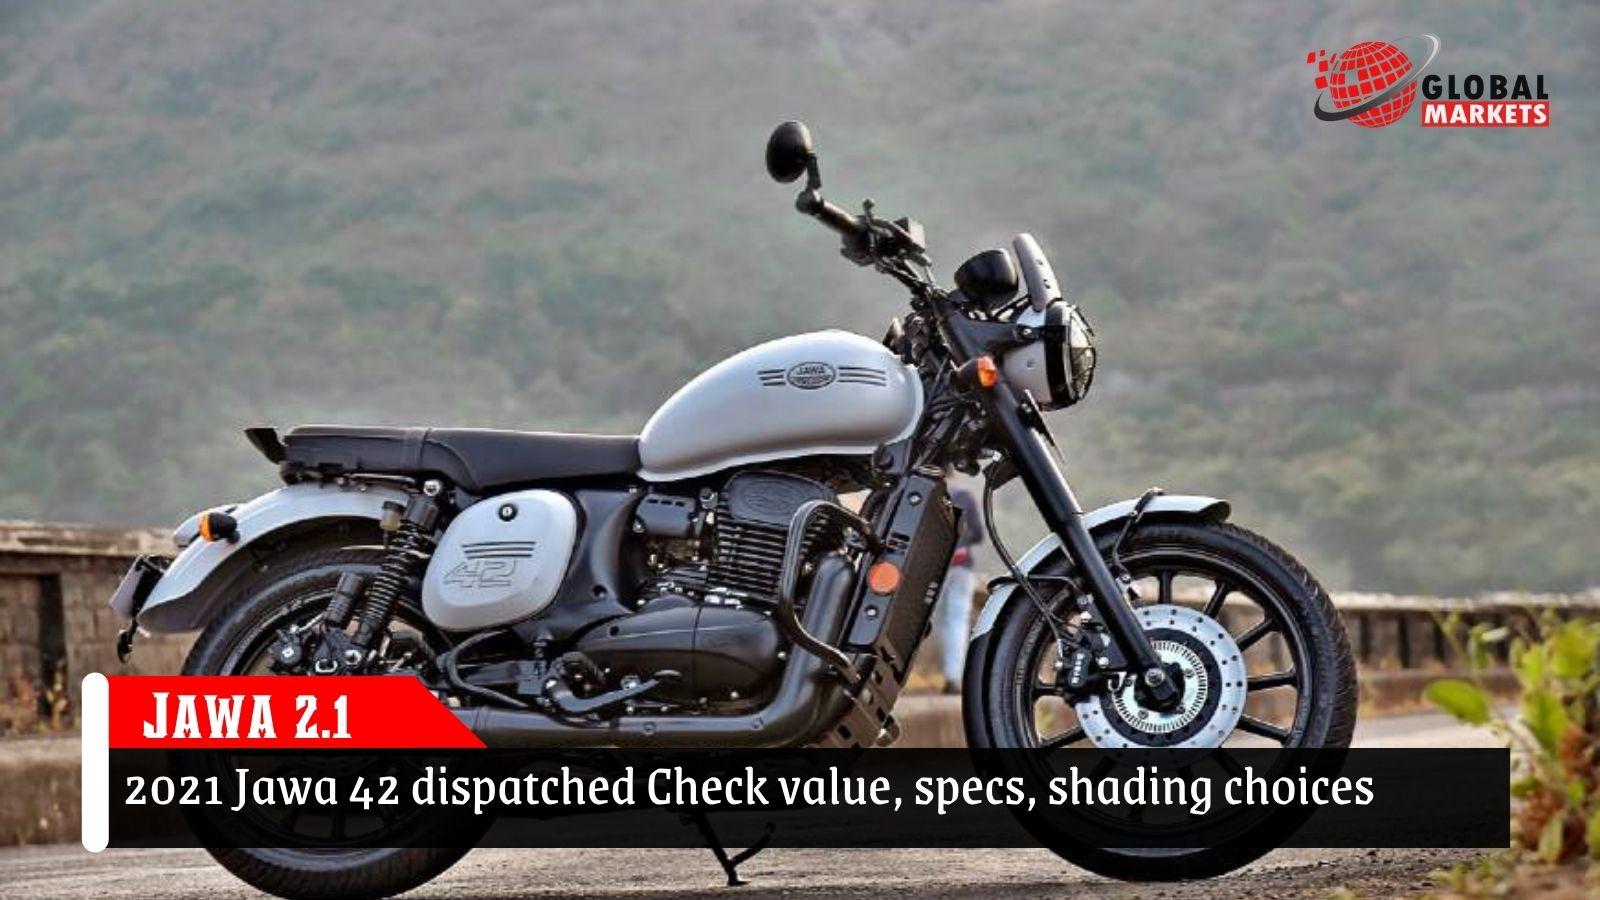 Jawa 2.1: 2021 Jawa 42 dispatched in India: Check value, specs, shading choices